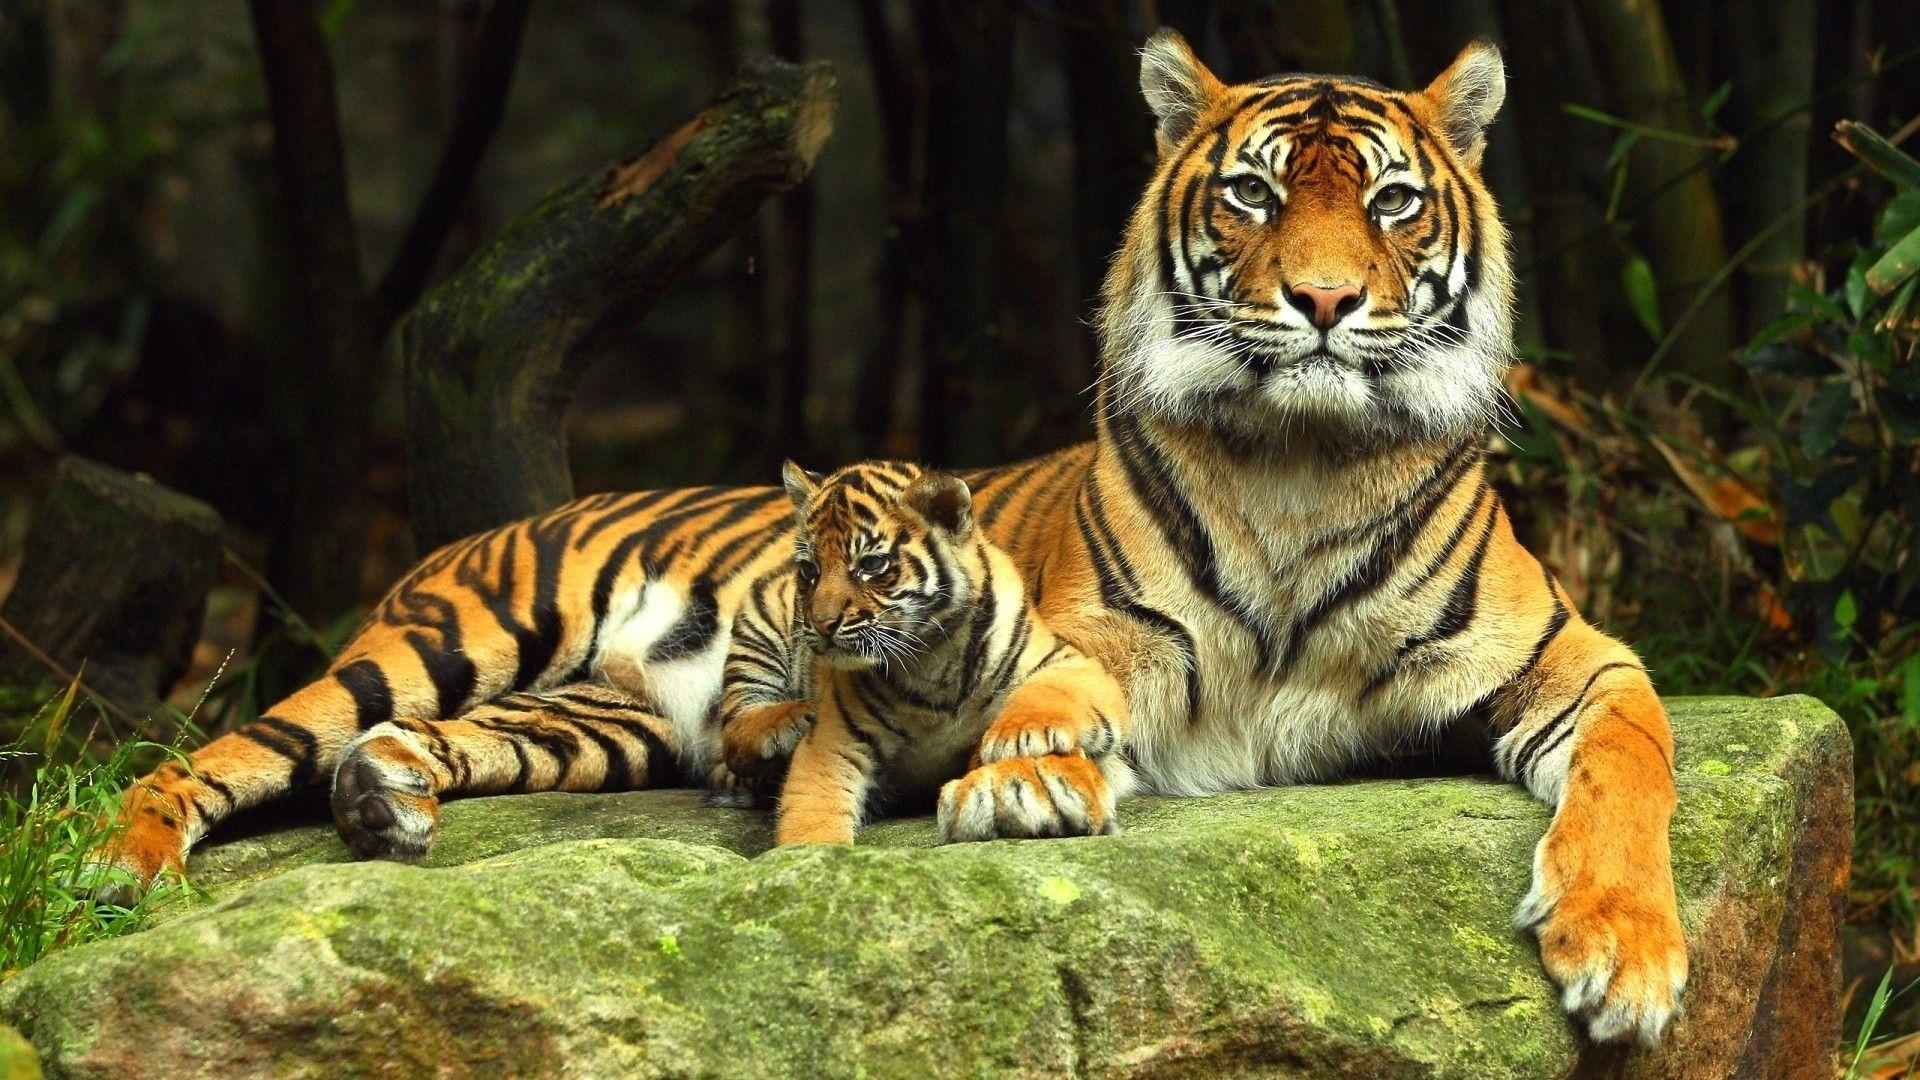 tiger desktop backgrounds | animals art | pinterest | animal